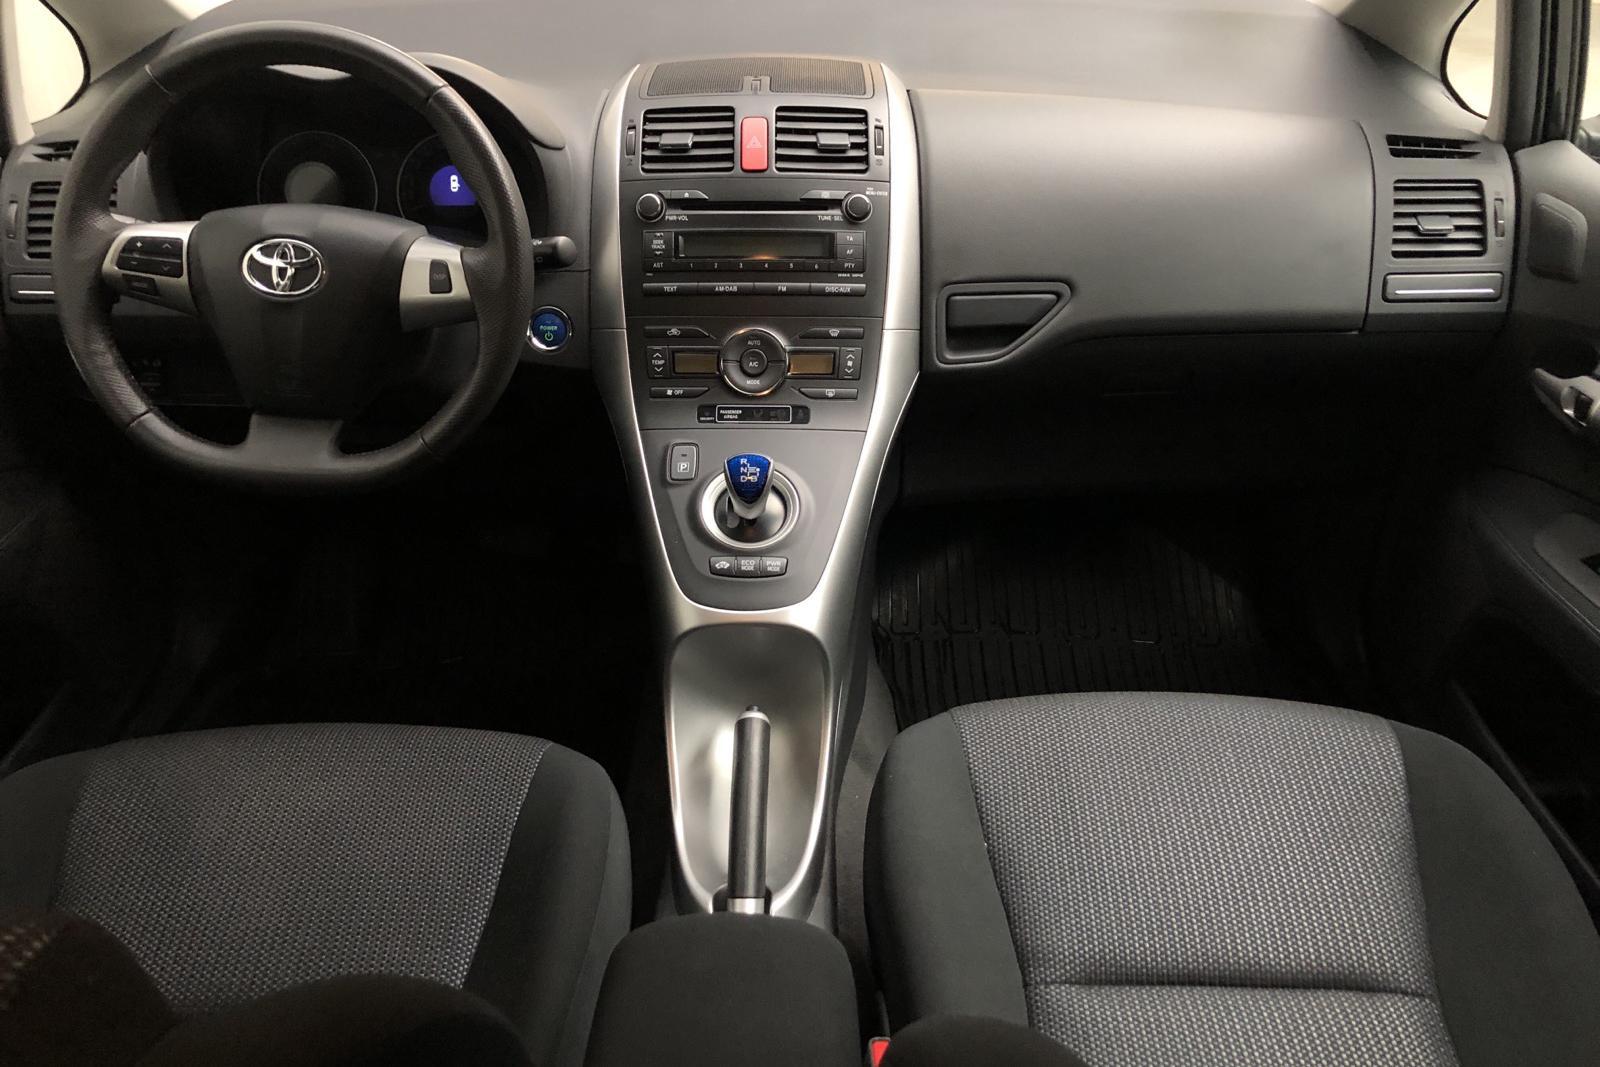 Toyota Auris 1.8 HSD 5dr (99hk) - 7 000 mil - Automat - svart - 2011